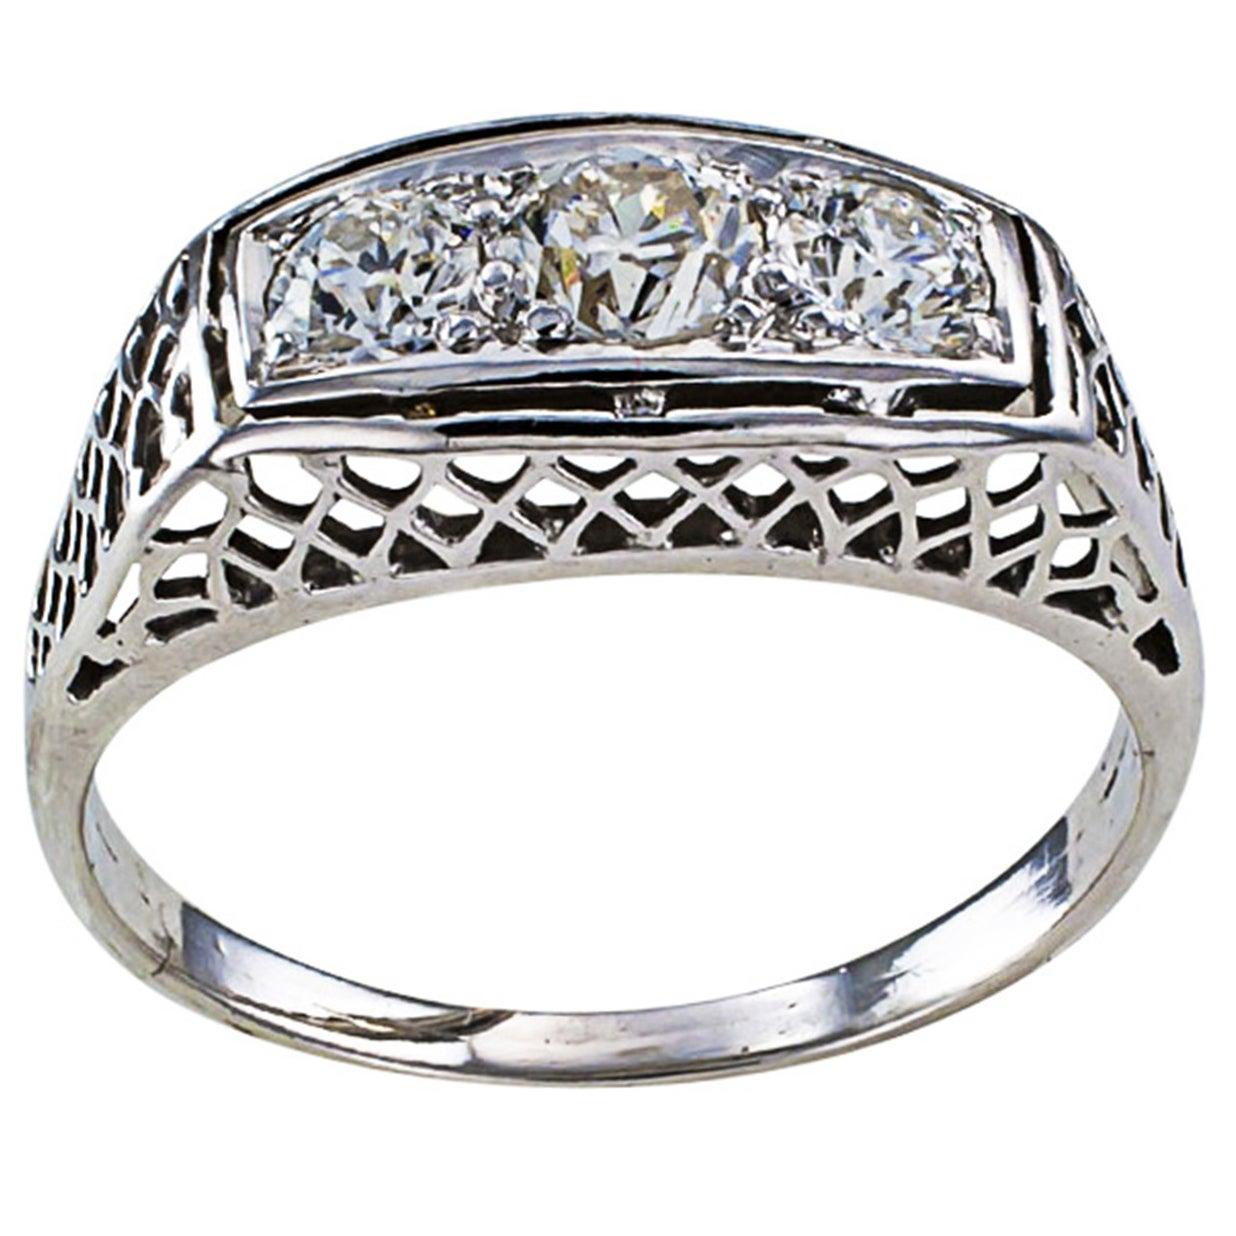 1920s Art Deco Three-Stone Diamond White Gold Engagement Ring